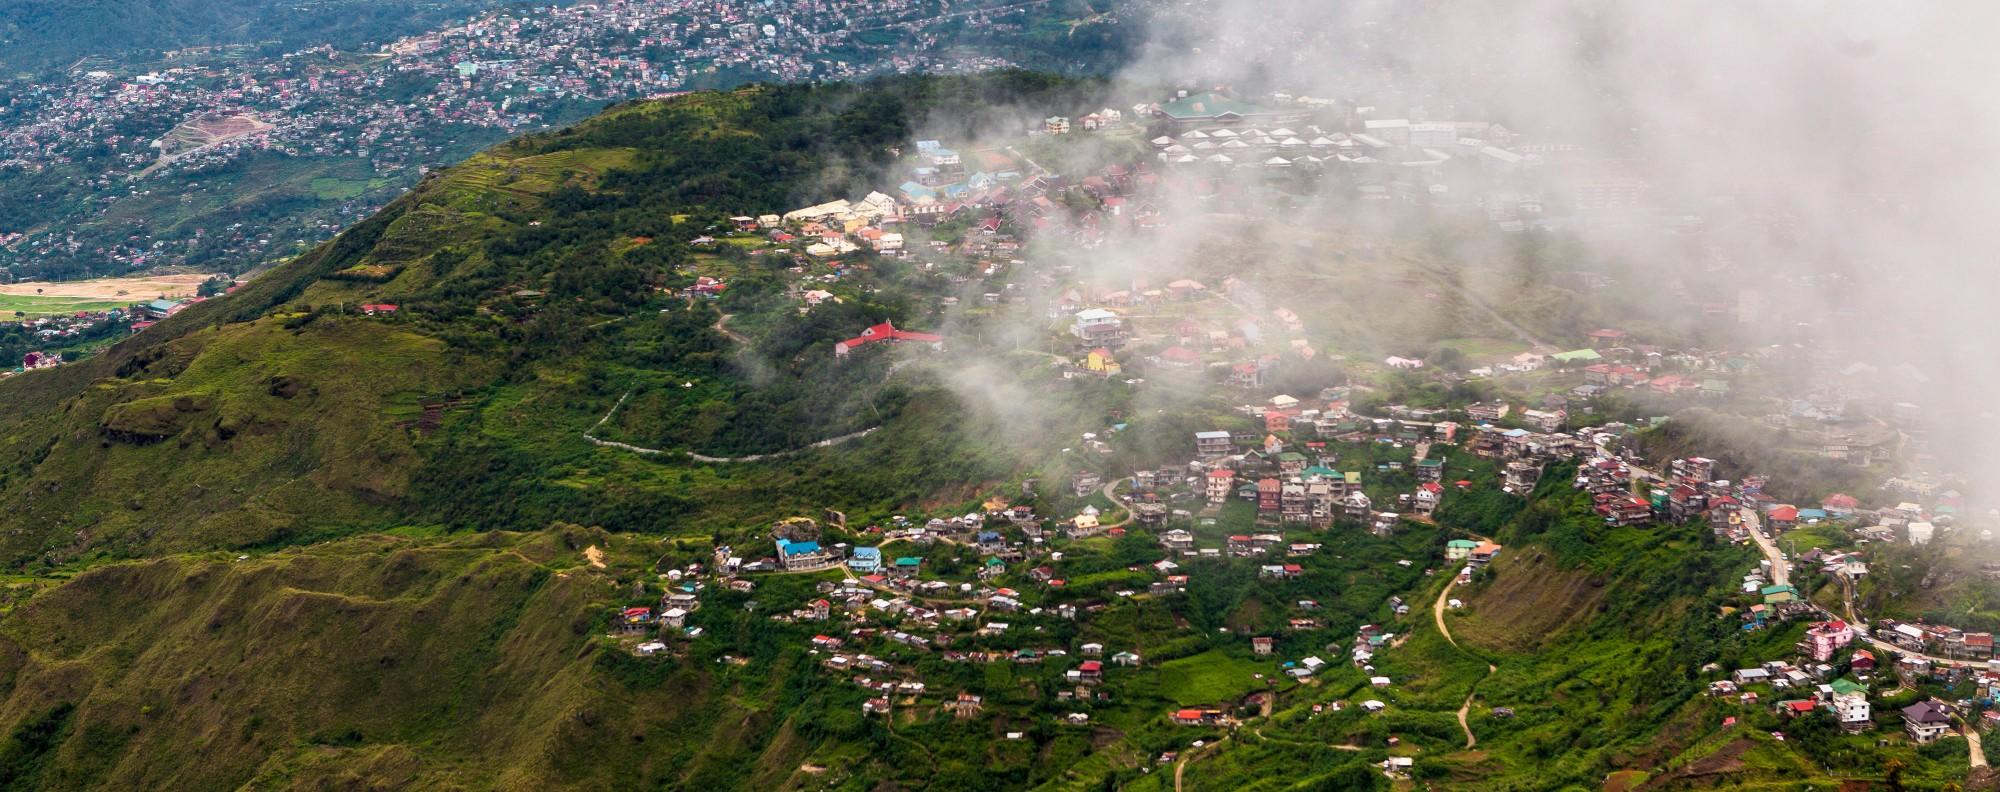 Baguio, The Philippines.